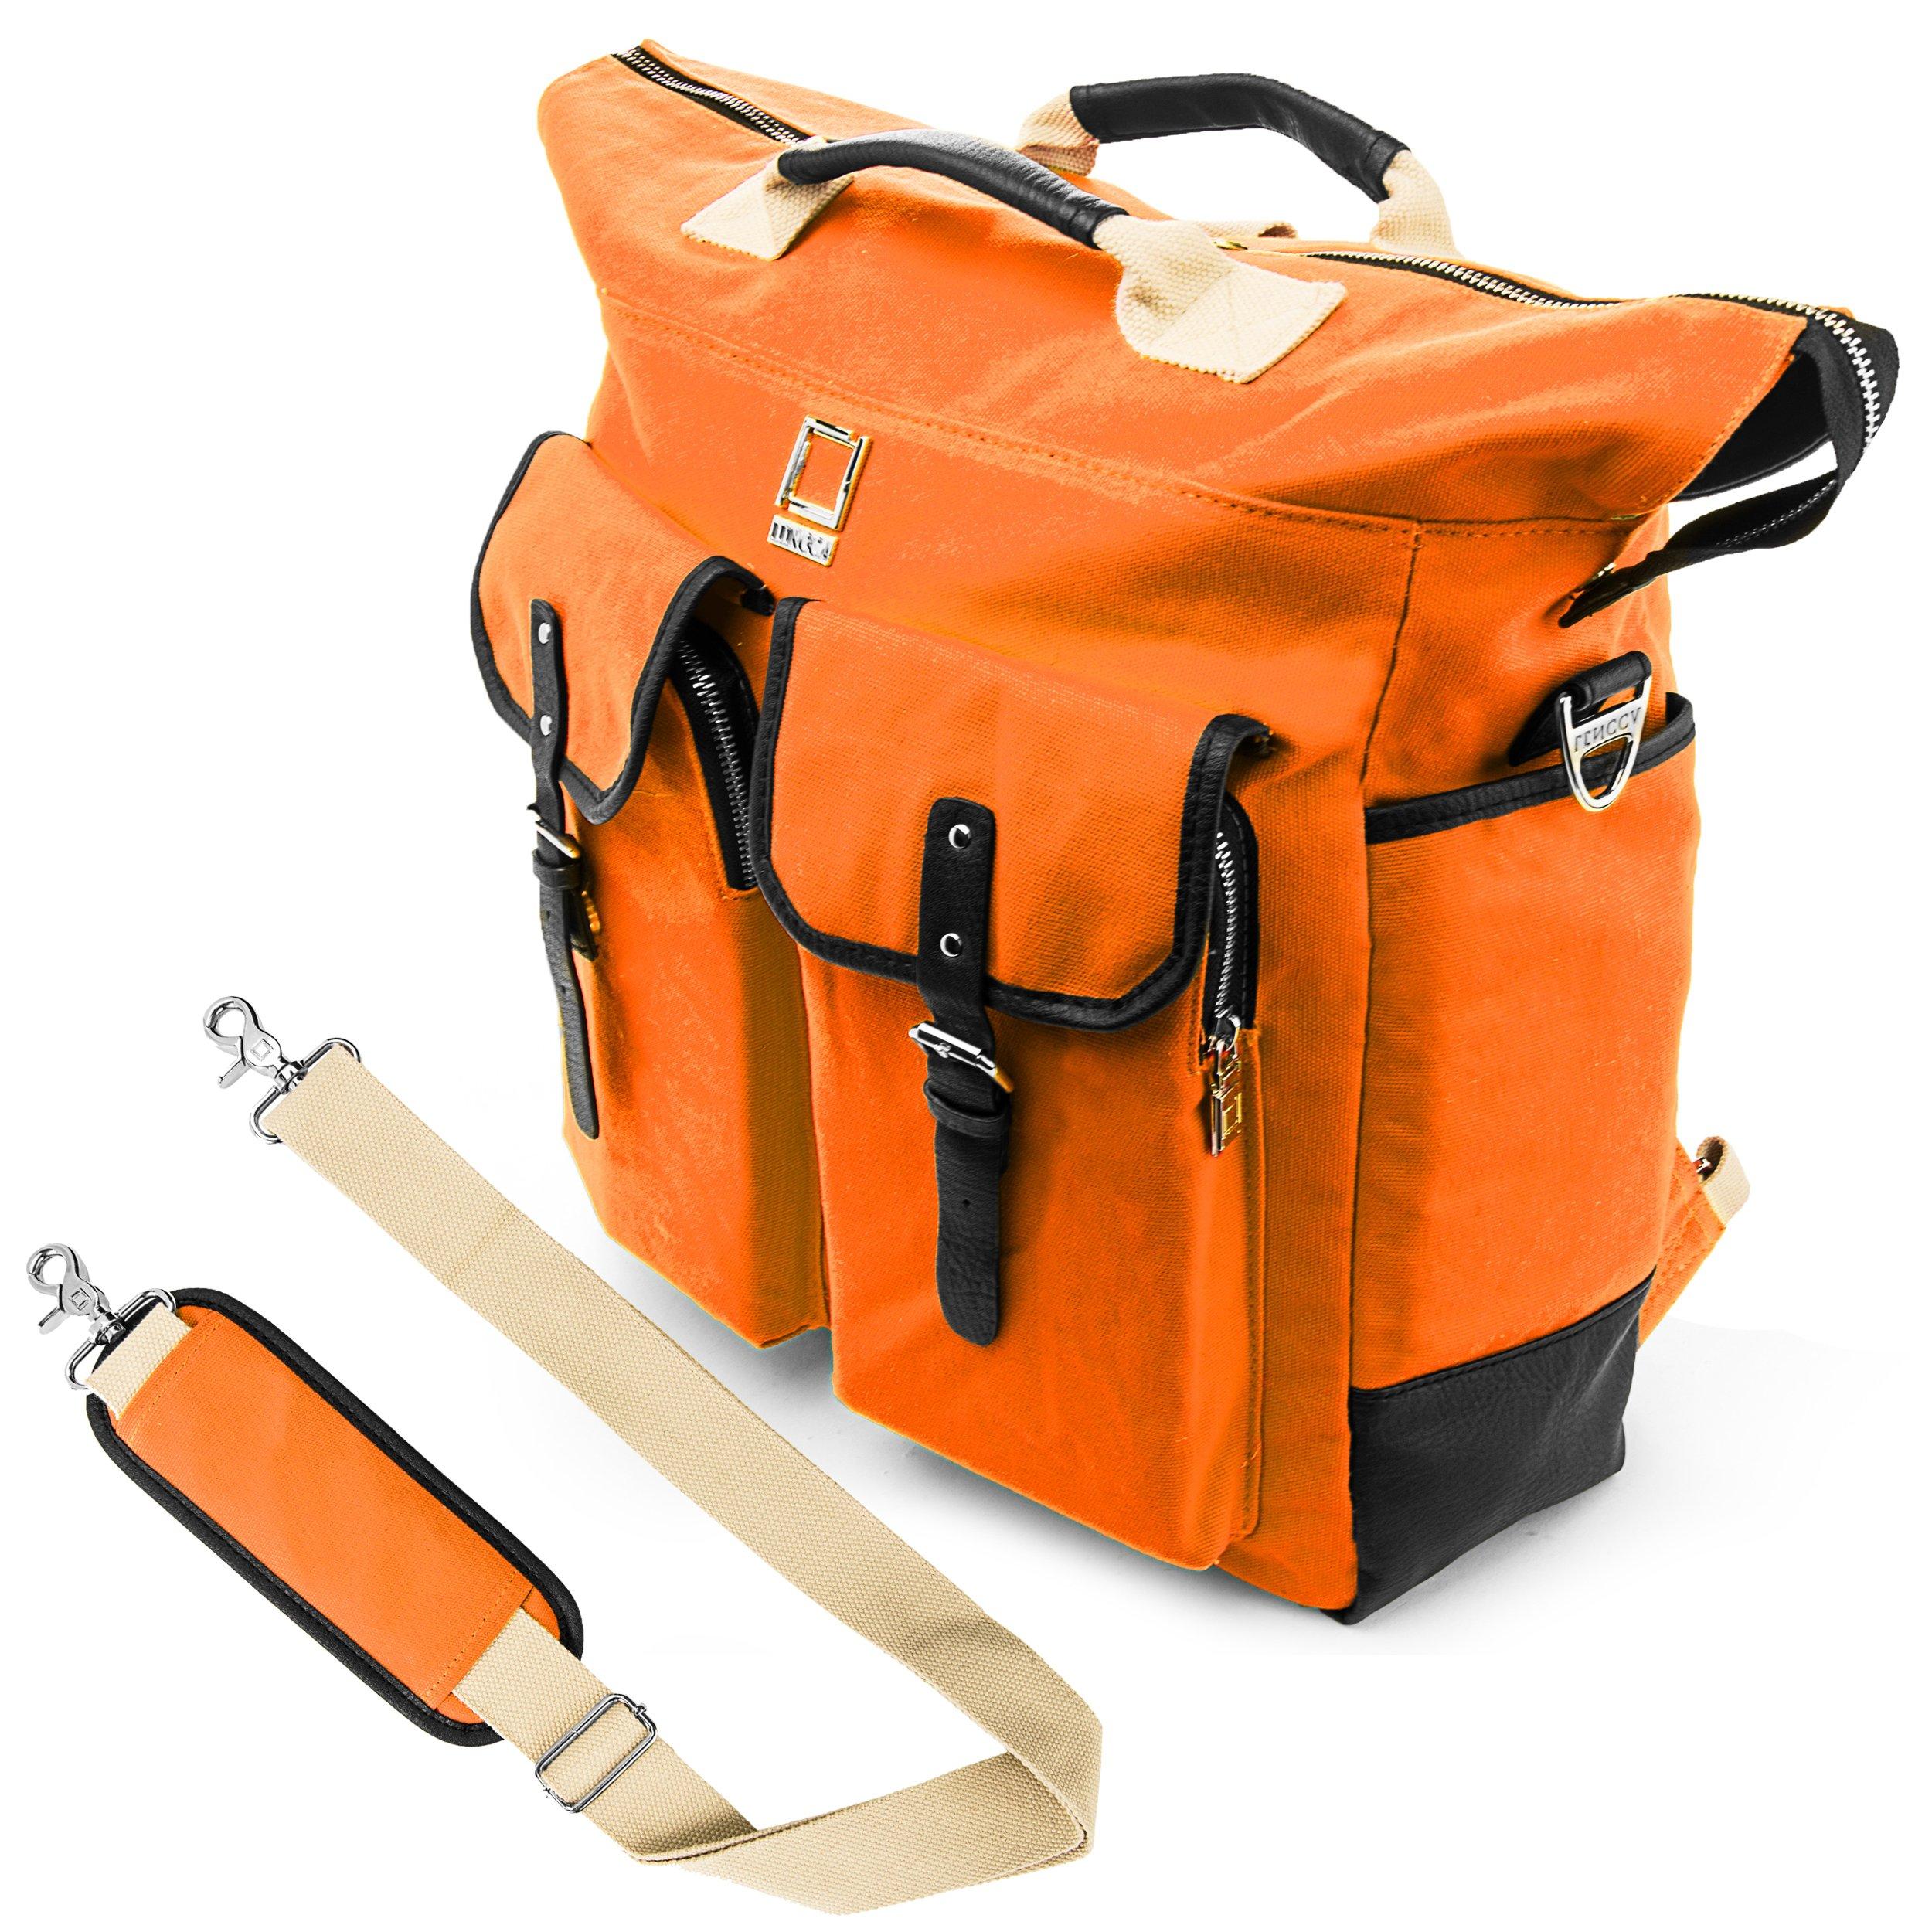 Lencca Universal Hybrid 3 in 1Design Carrying / Tote / Messenger / Crossbody / Backpack / Shoulder Bag for Acer Aspire V15 VN7-591G / Aspire E E5-521 / E5-571 / ES1-512 Series 15.6 inch Fit up to 15.6 inch Notebook / Google Chromebook / Ultrabook / Laptop